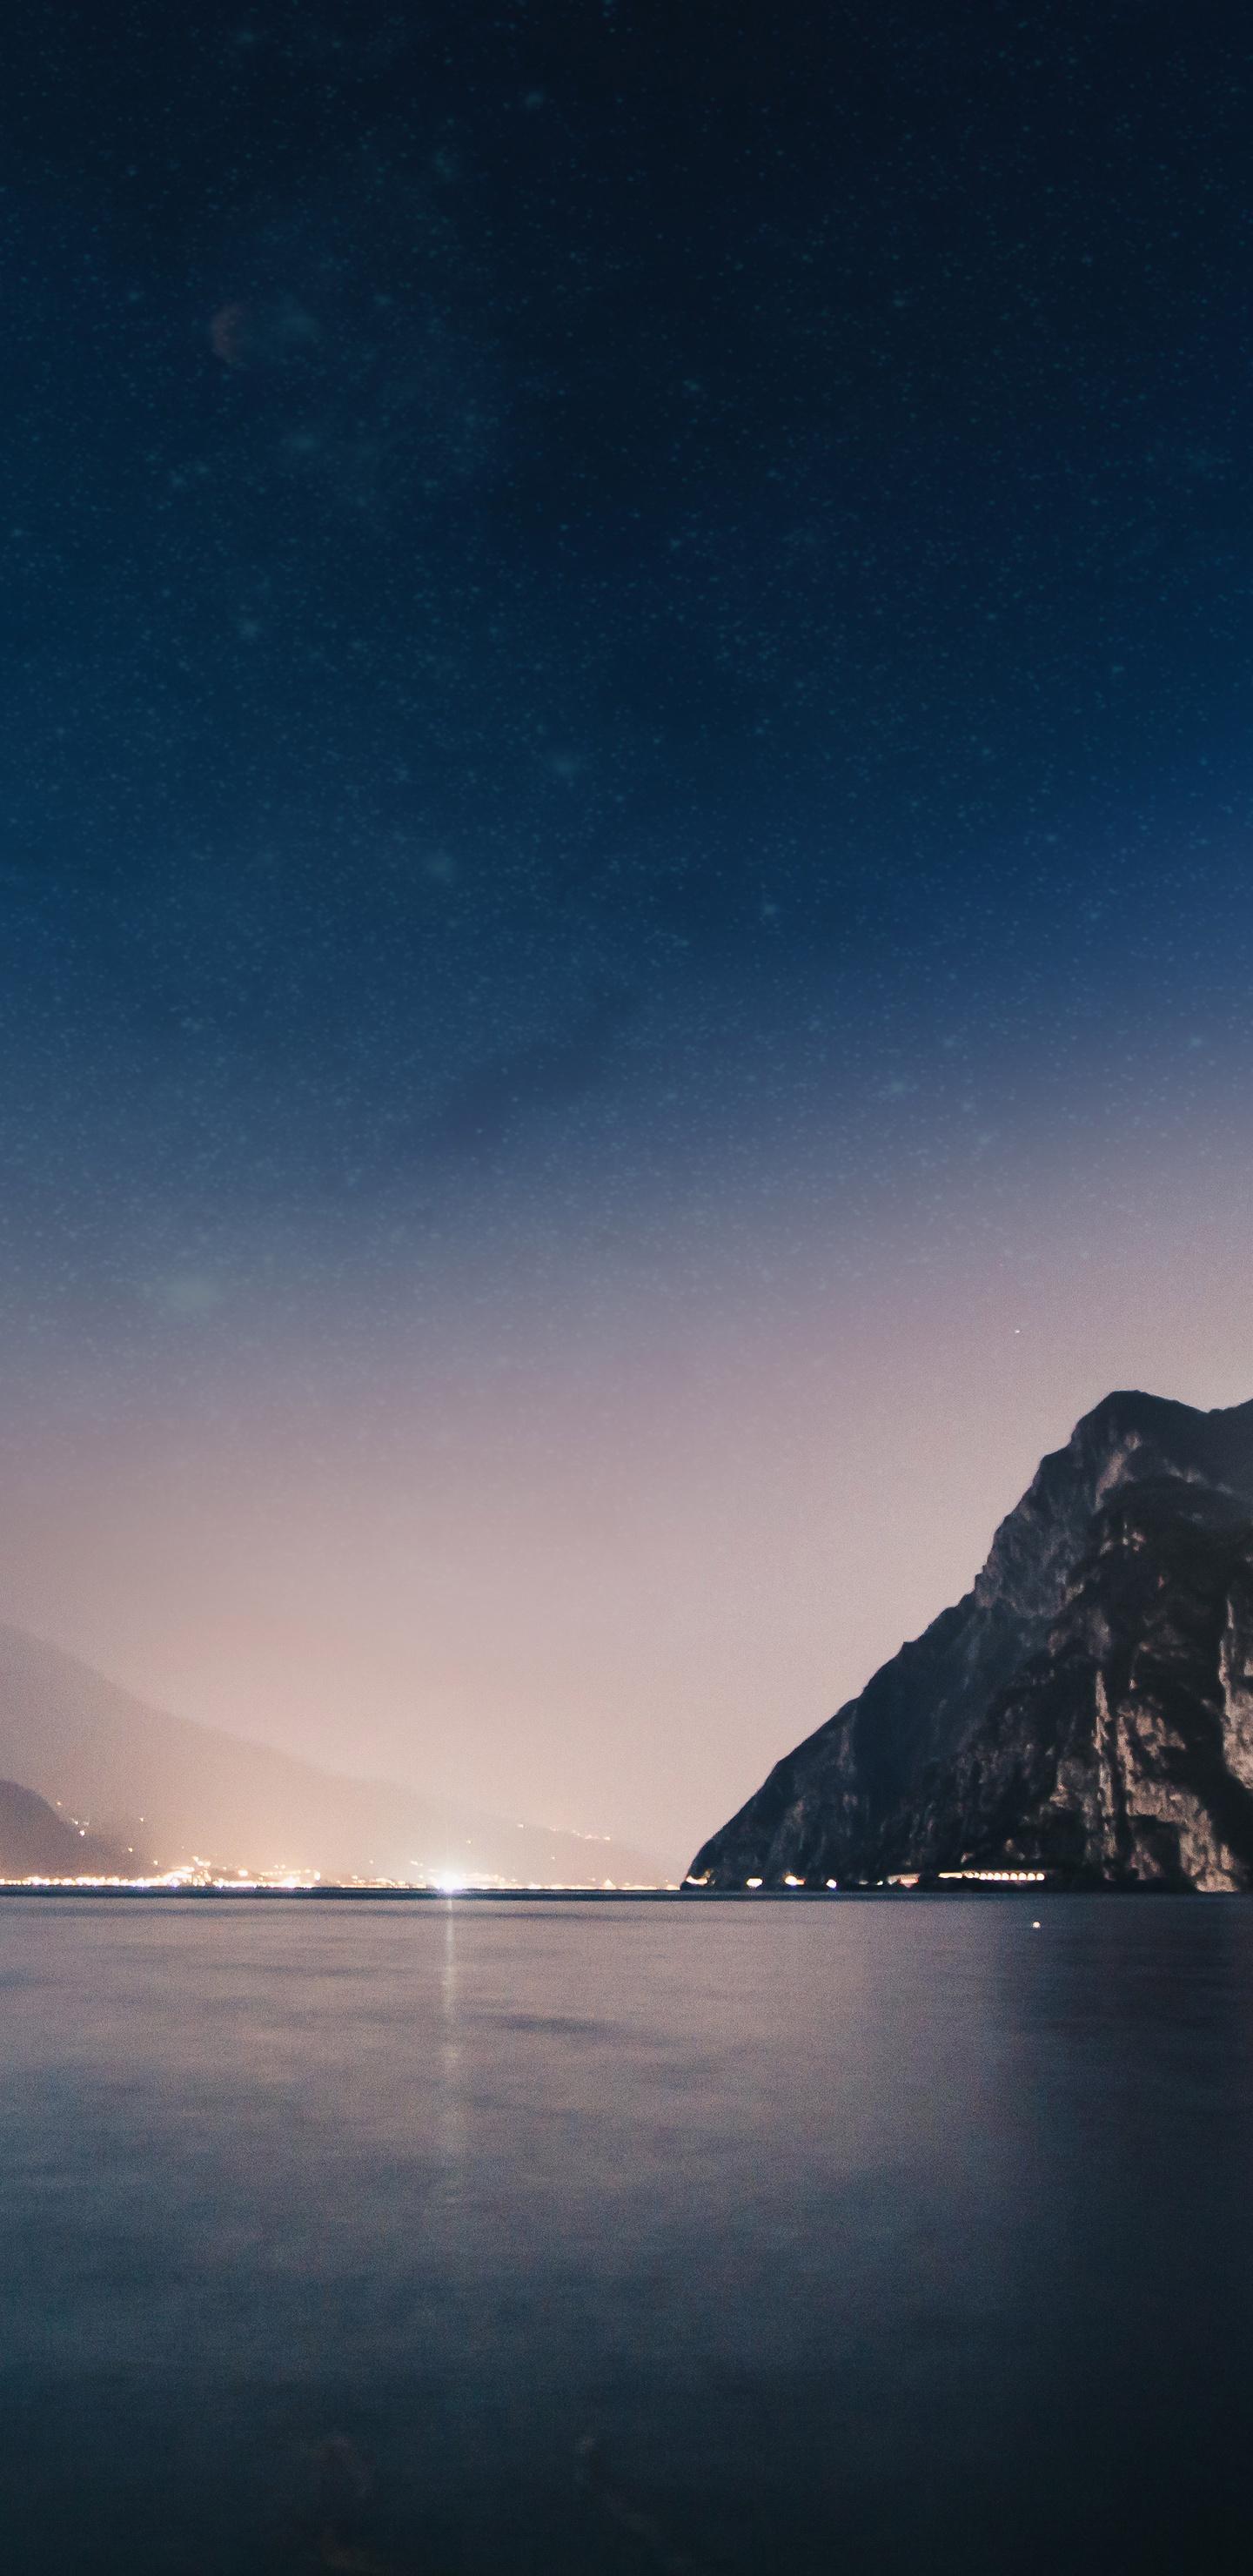 1440x2960 mountains night sea 4k 5k samsung galaxy note 9 - Night mountain wallpaper 4k ...